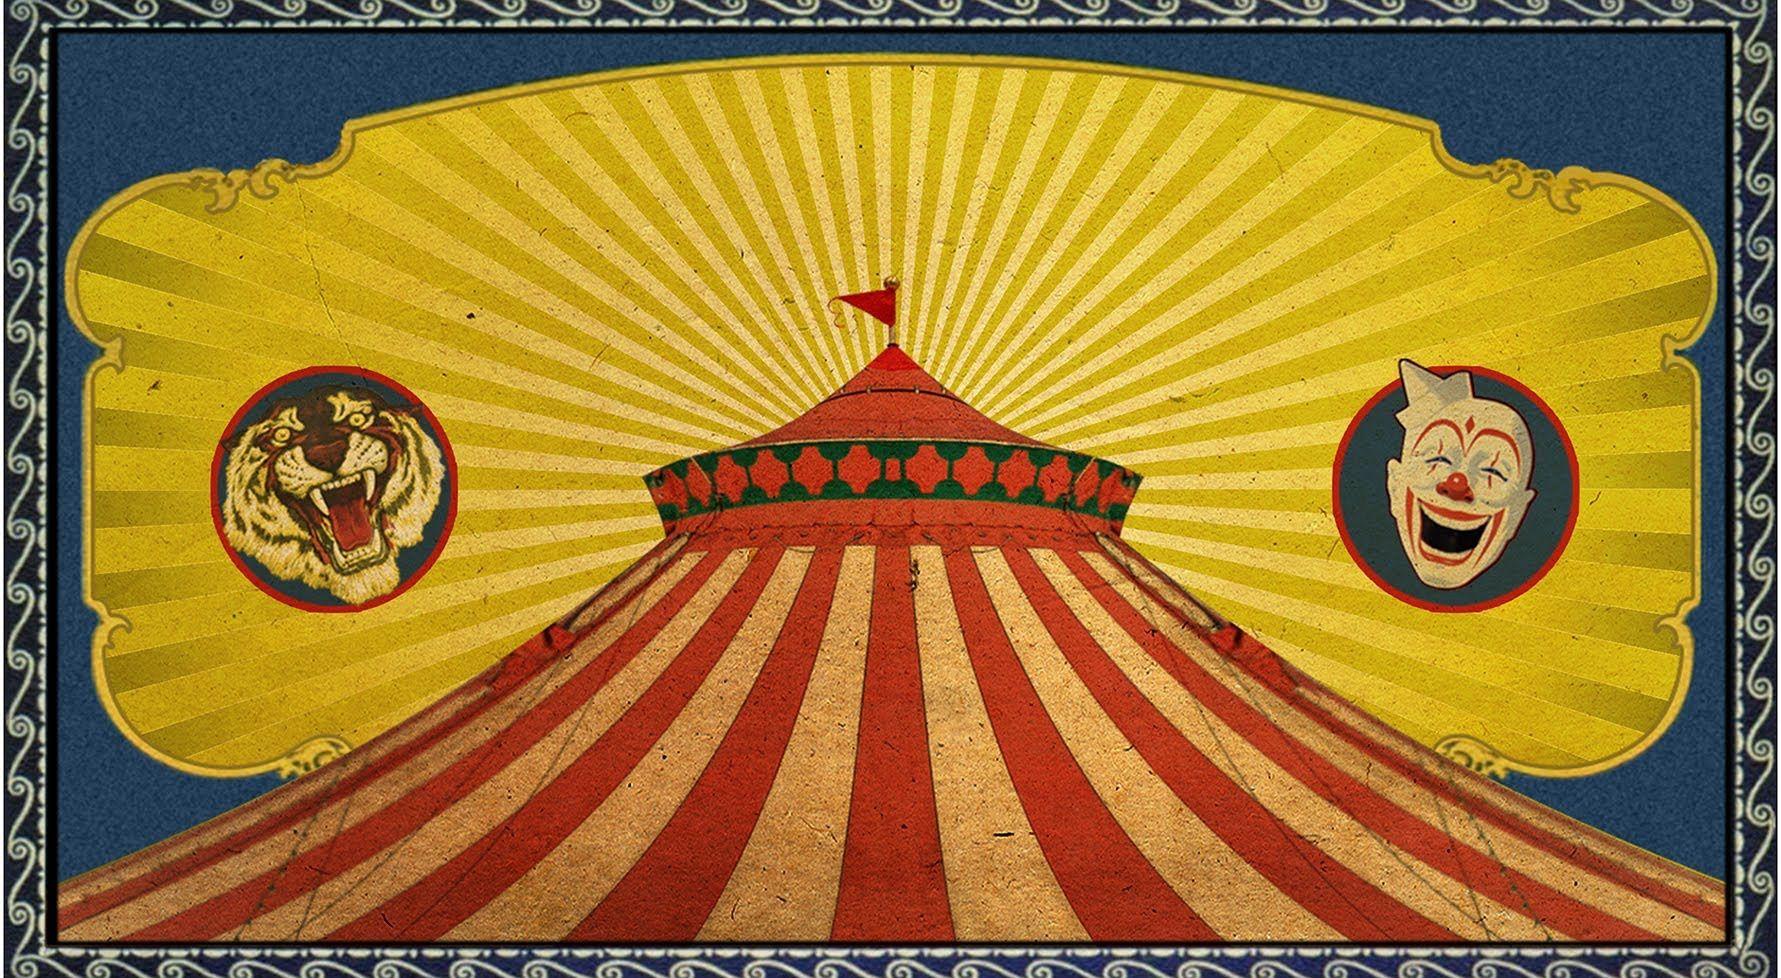 Pin by joshua frankel on clowns pinterest circus poster photoshop tutorial baditri Choice Image